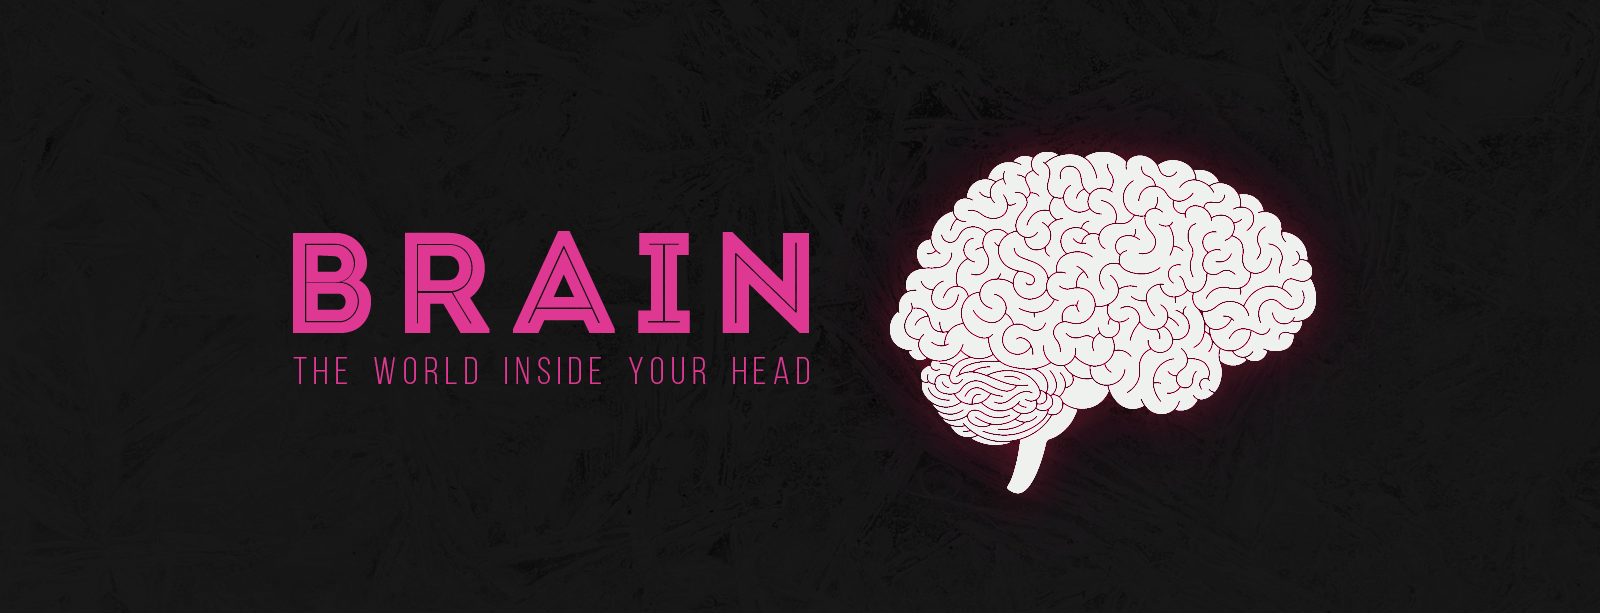 BRAIN: The World Inside Your Head